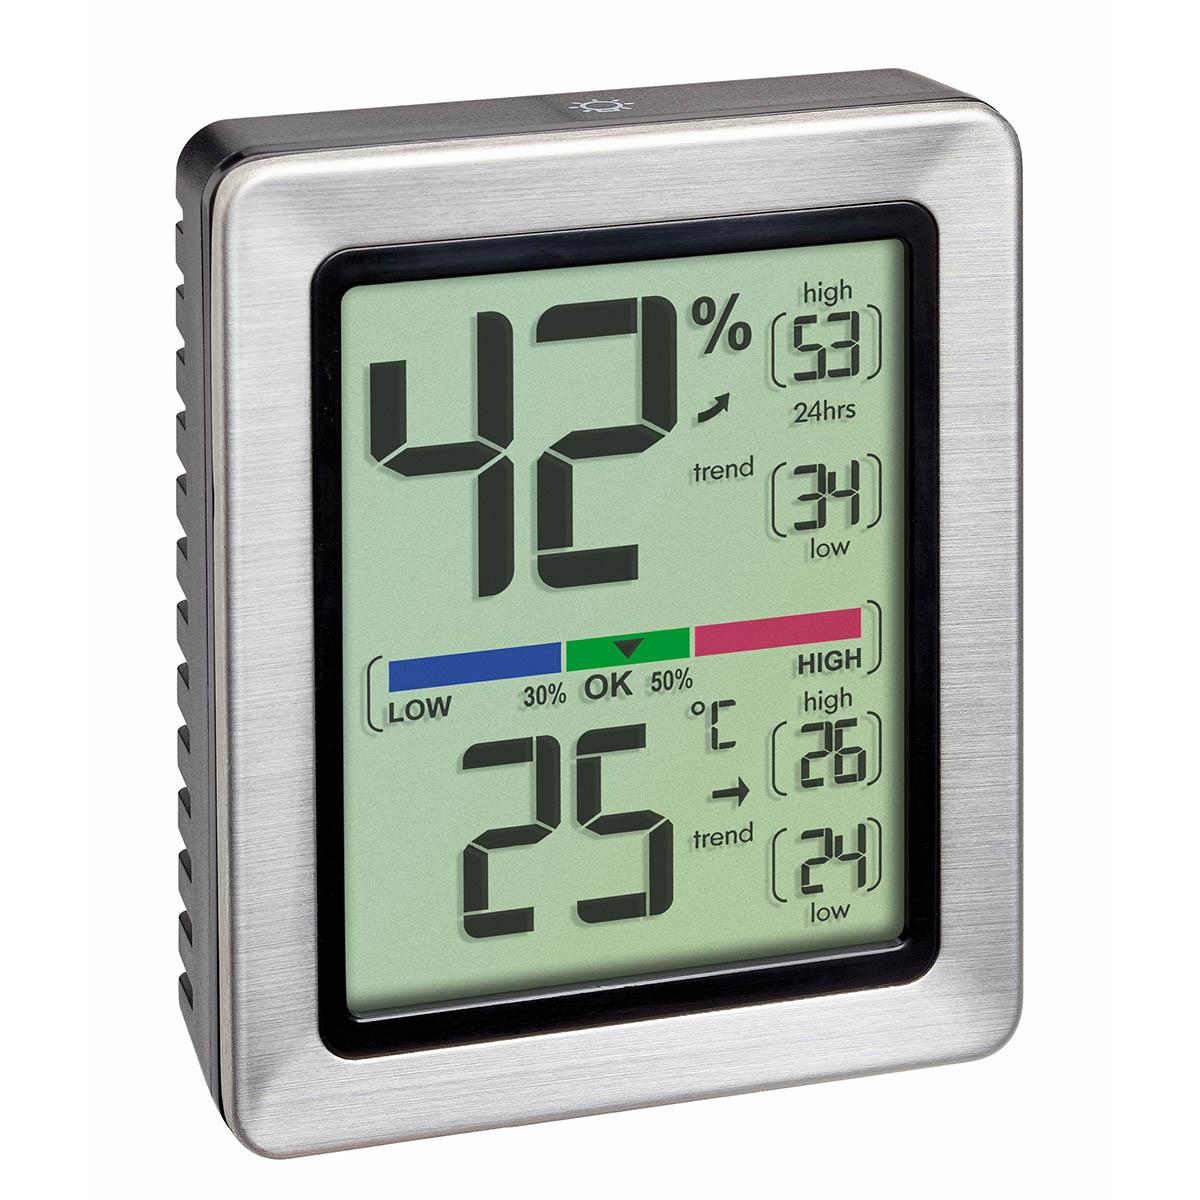 30-5047-54-digitales-thermo-hygrometer-exacto-1200x1200px.jpg